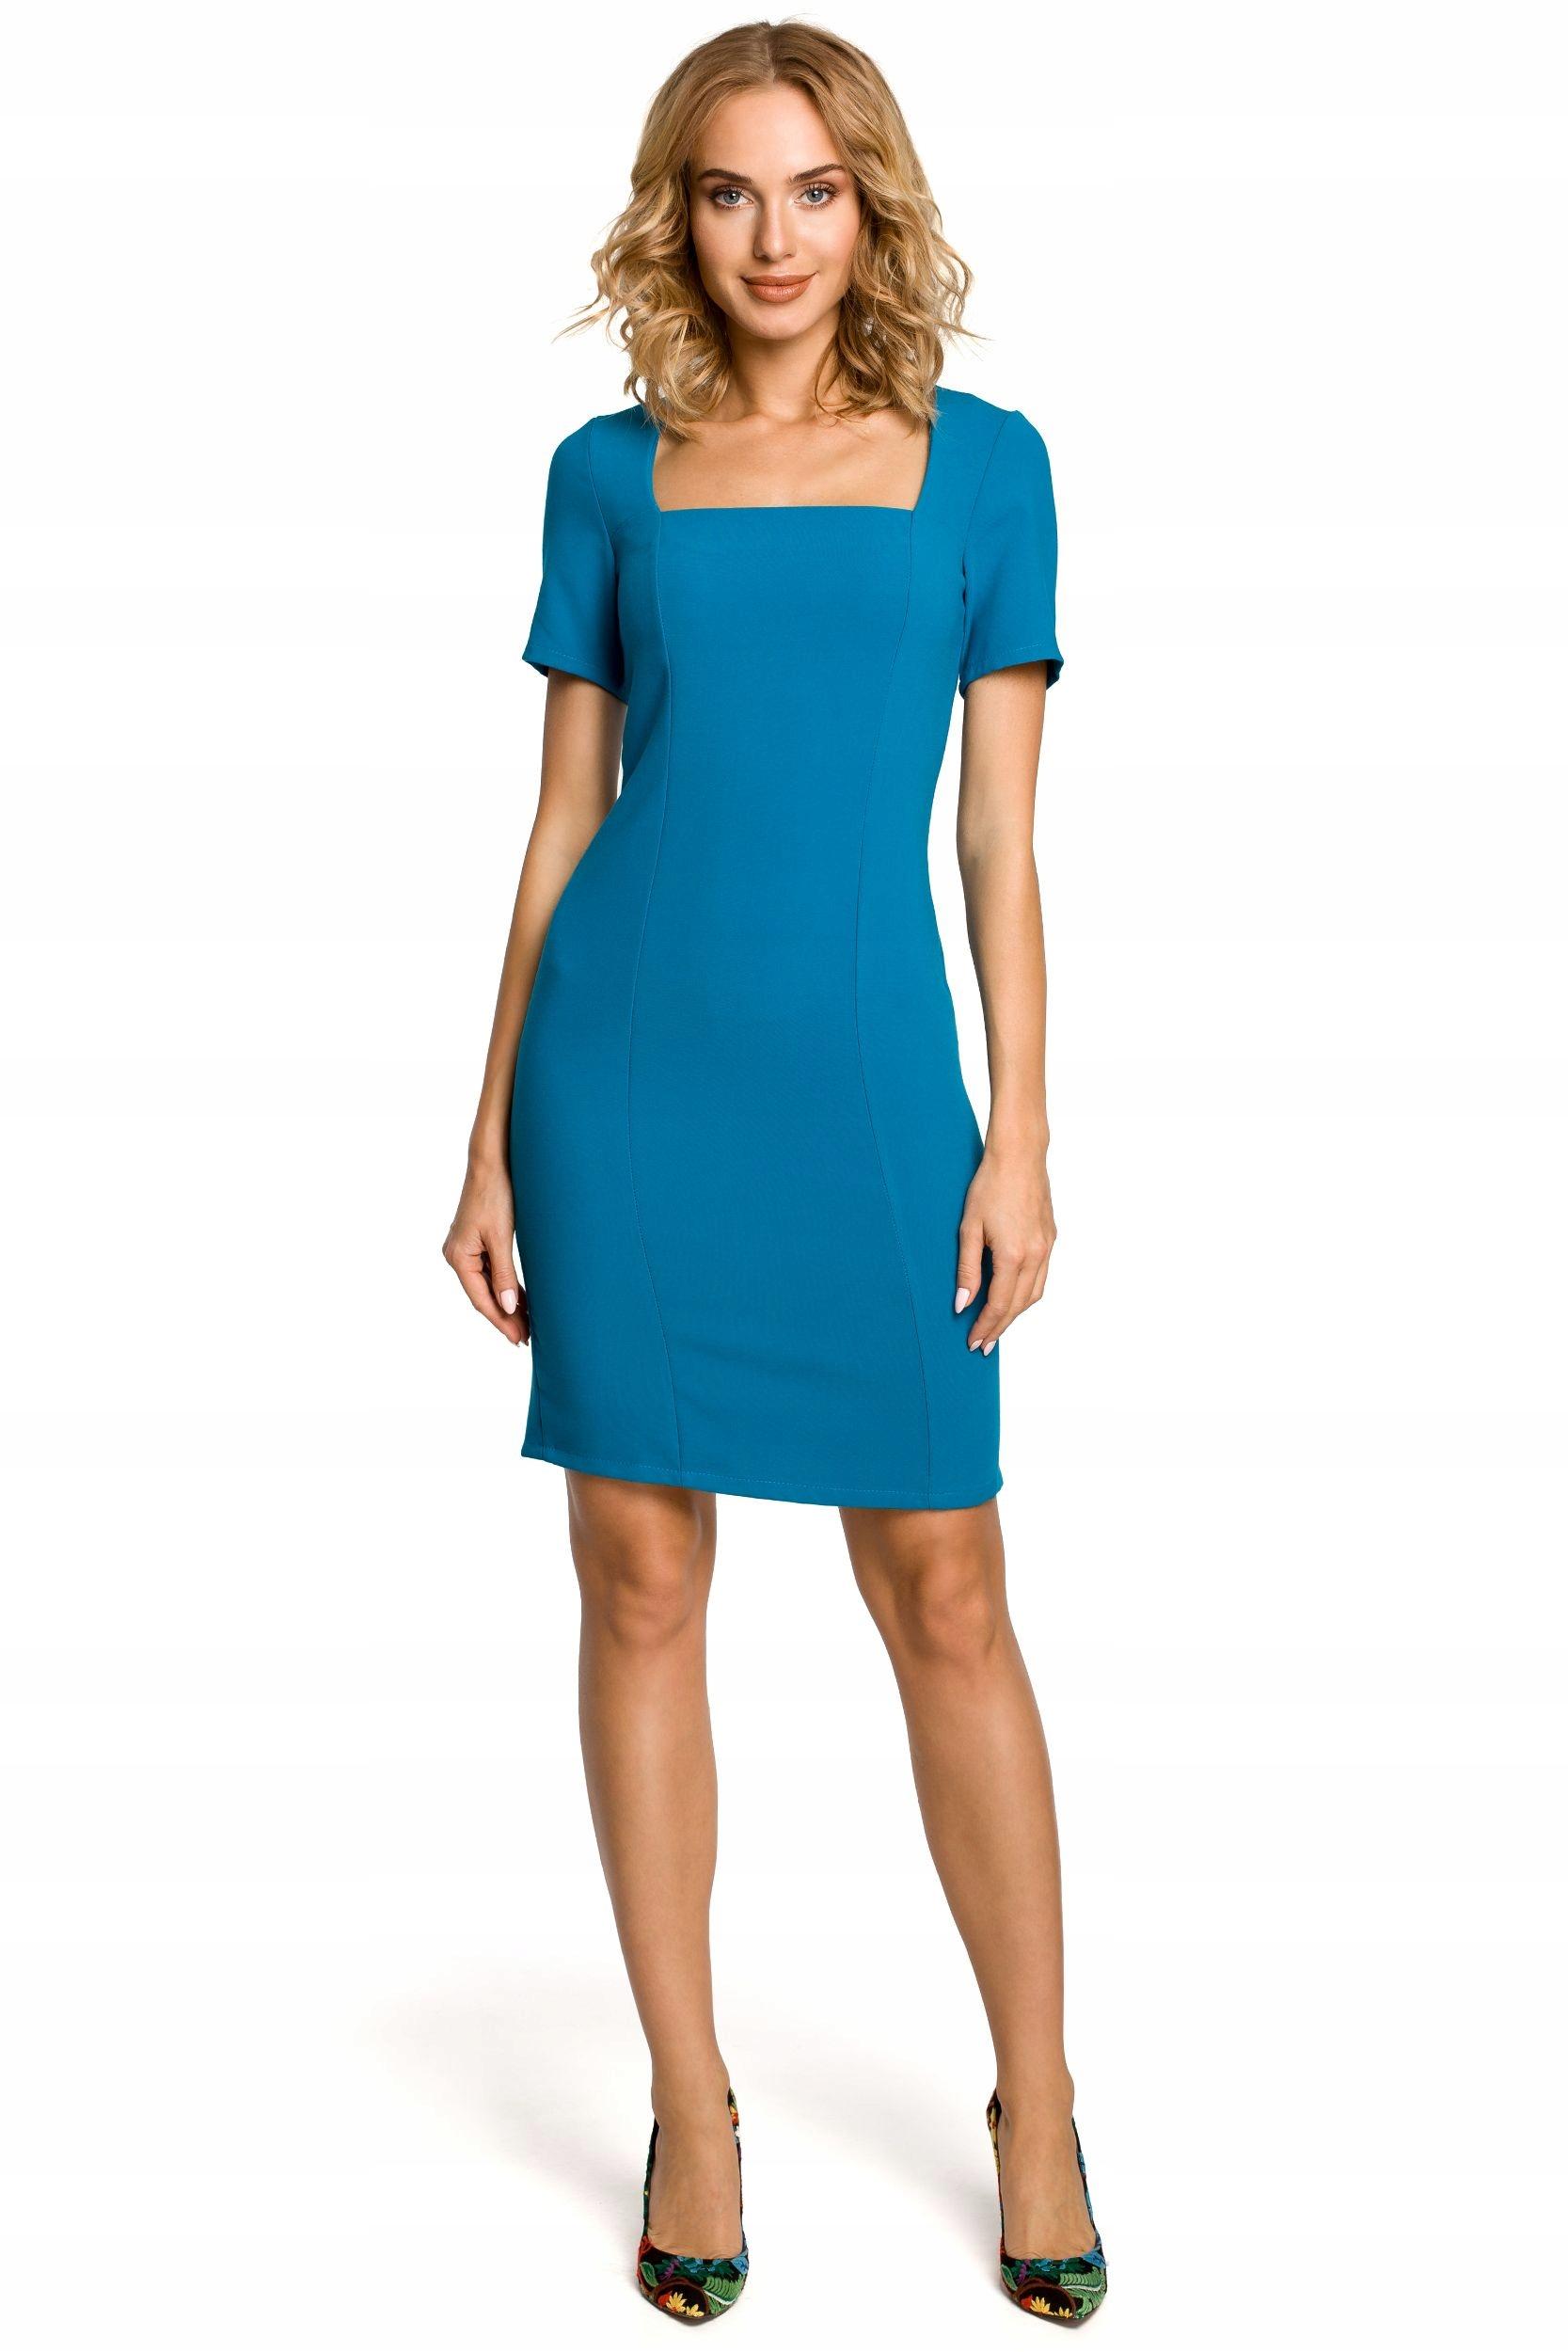 d89146fbb6 M192 Ołówkowa sukienka przed kolano - turkusowa 38 - 7566780991 ...